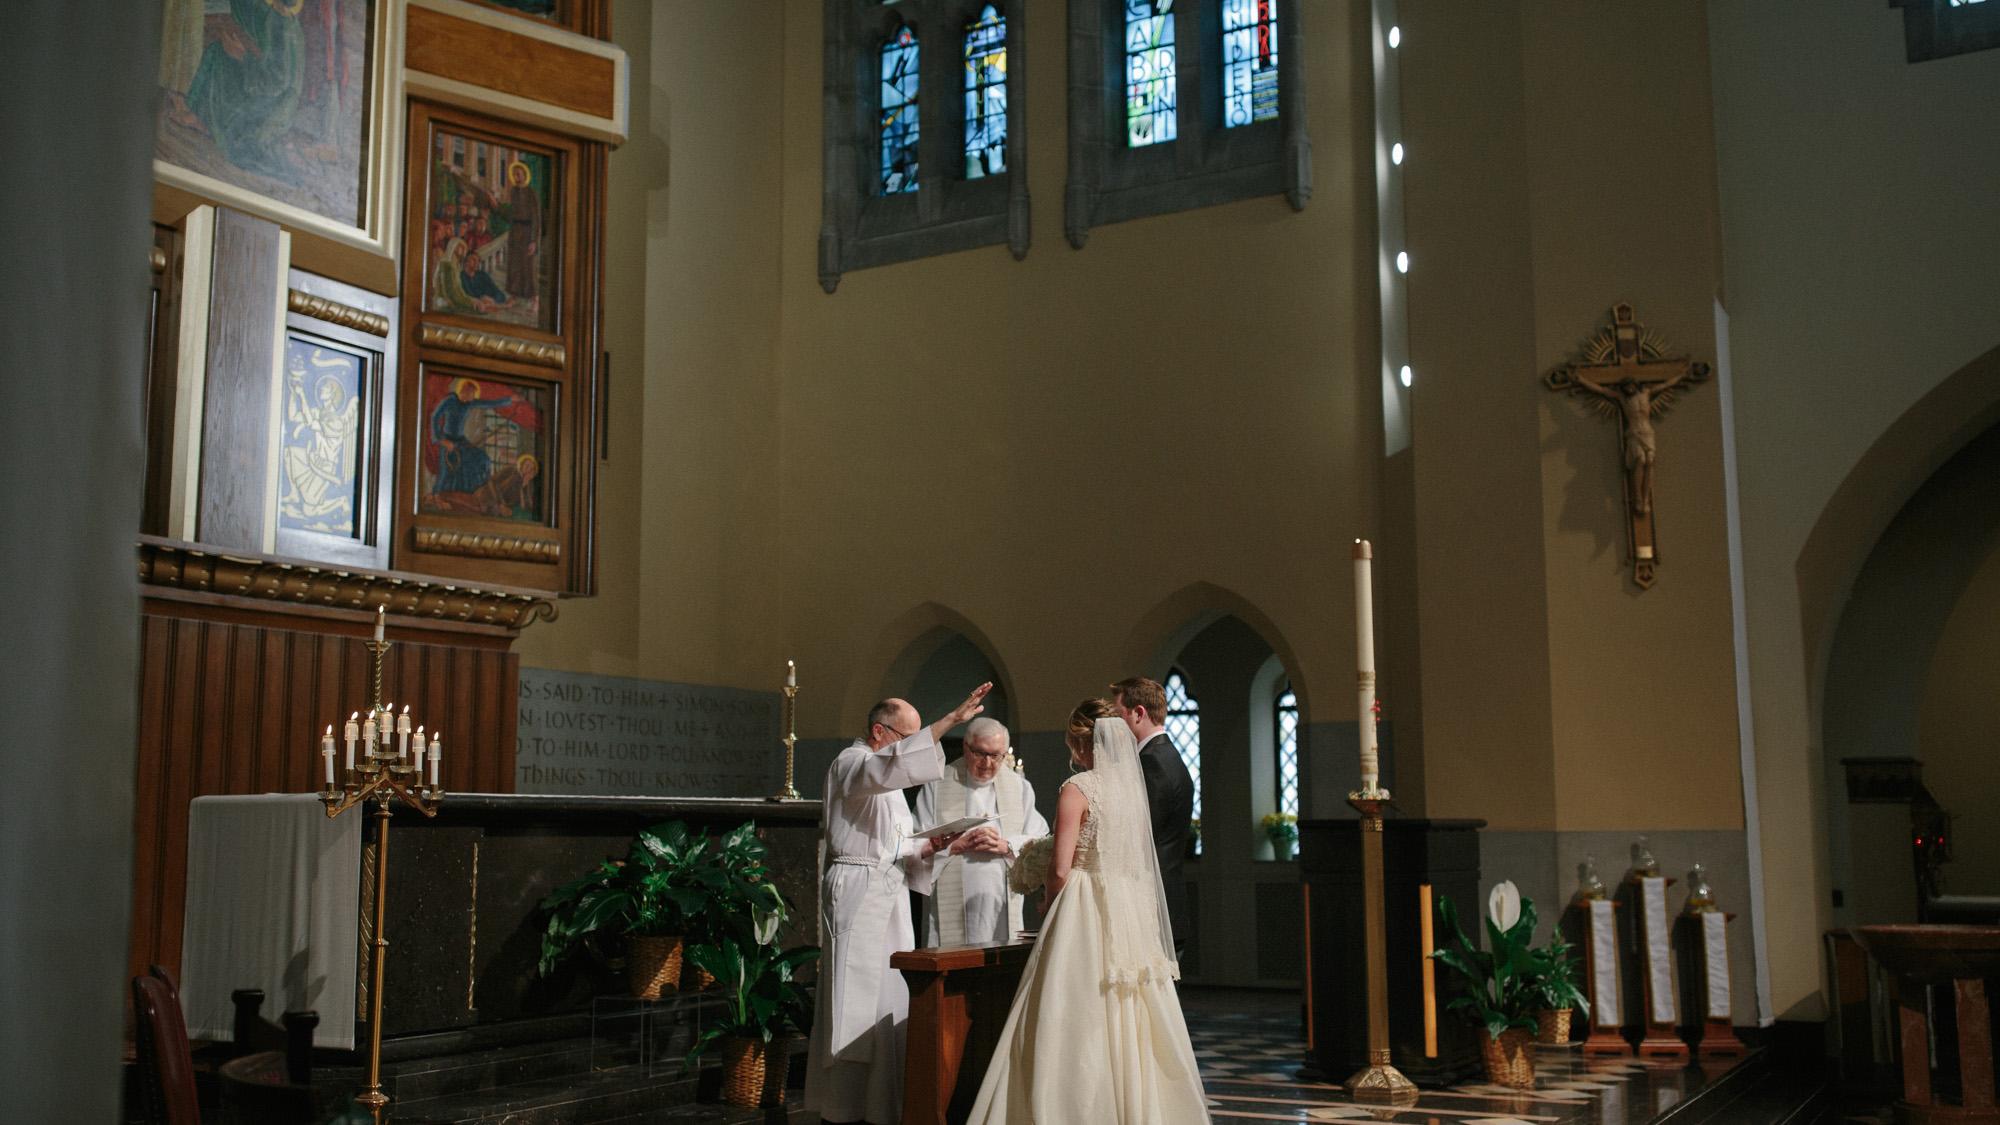 Alec_Vanderboom_kansas_city_hip_wedding_photos-0034.jpg